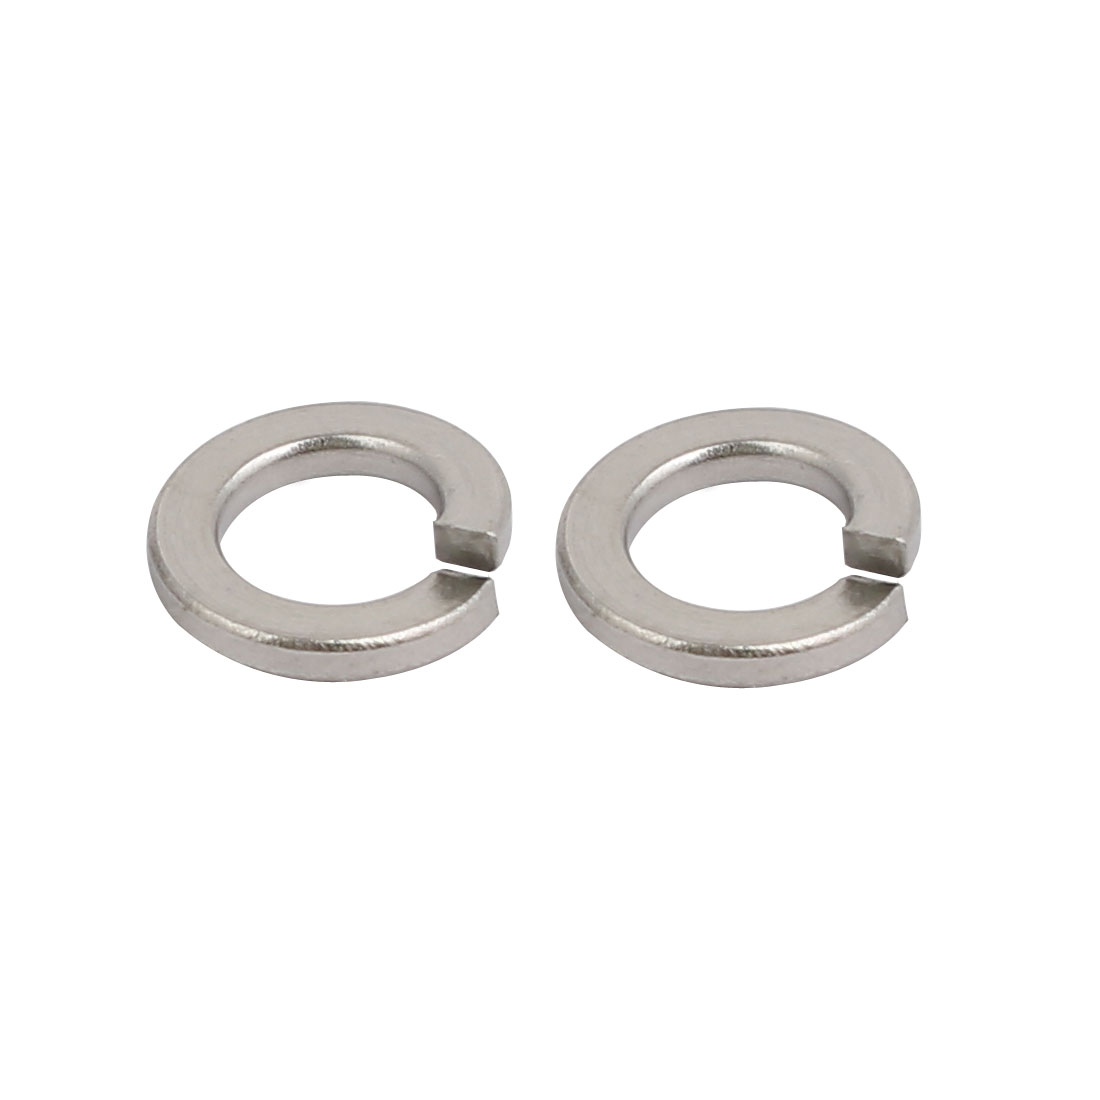 3//16 Inch Inner Diameter Zinc-plated Carbon Steel Split Lock Washer 100pcs